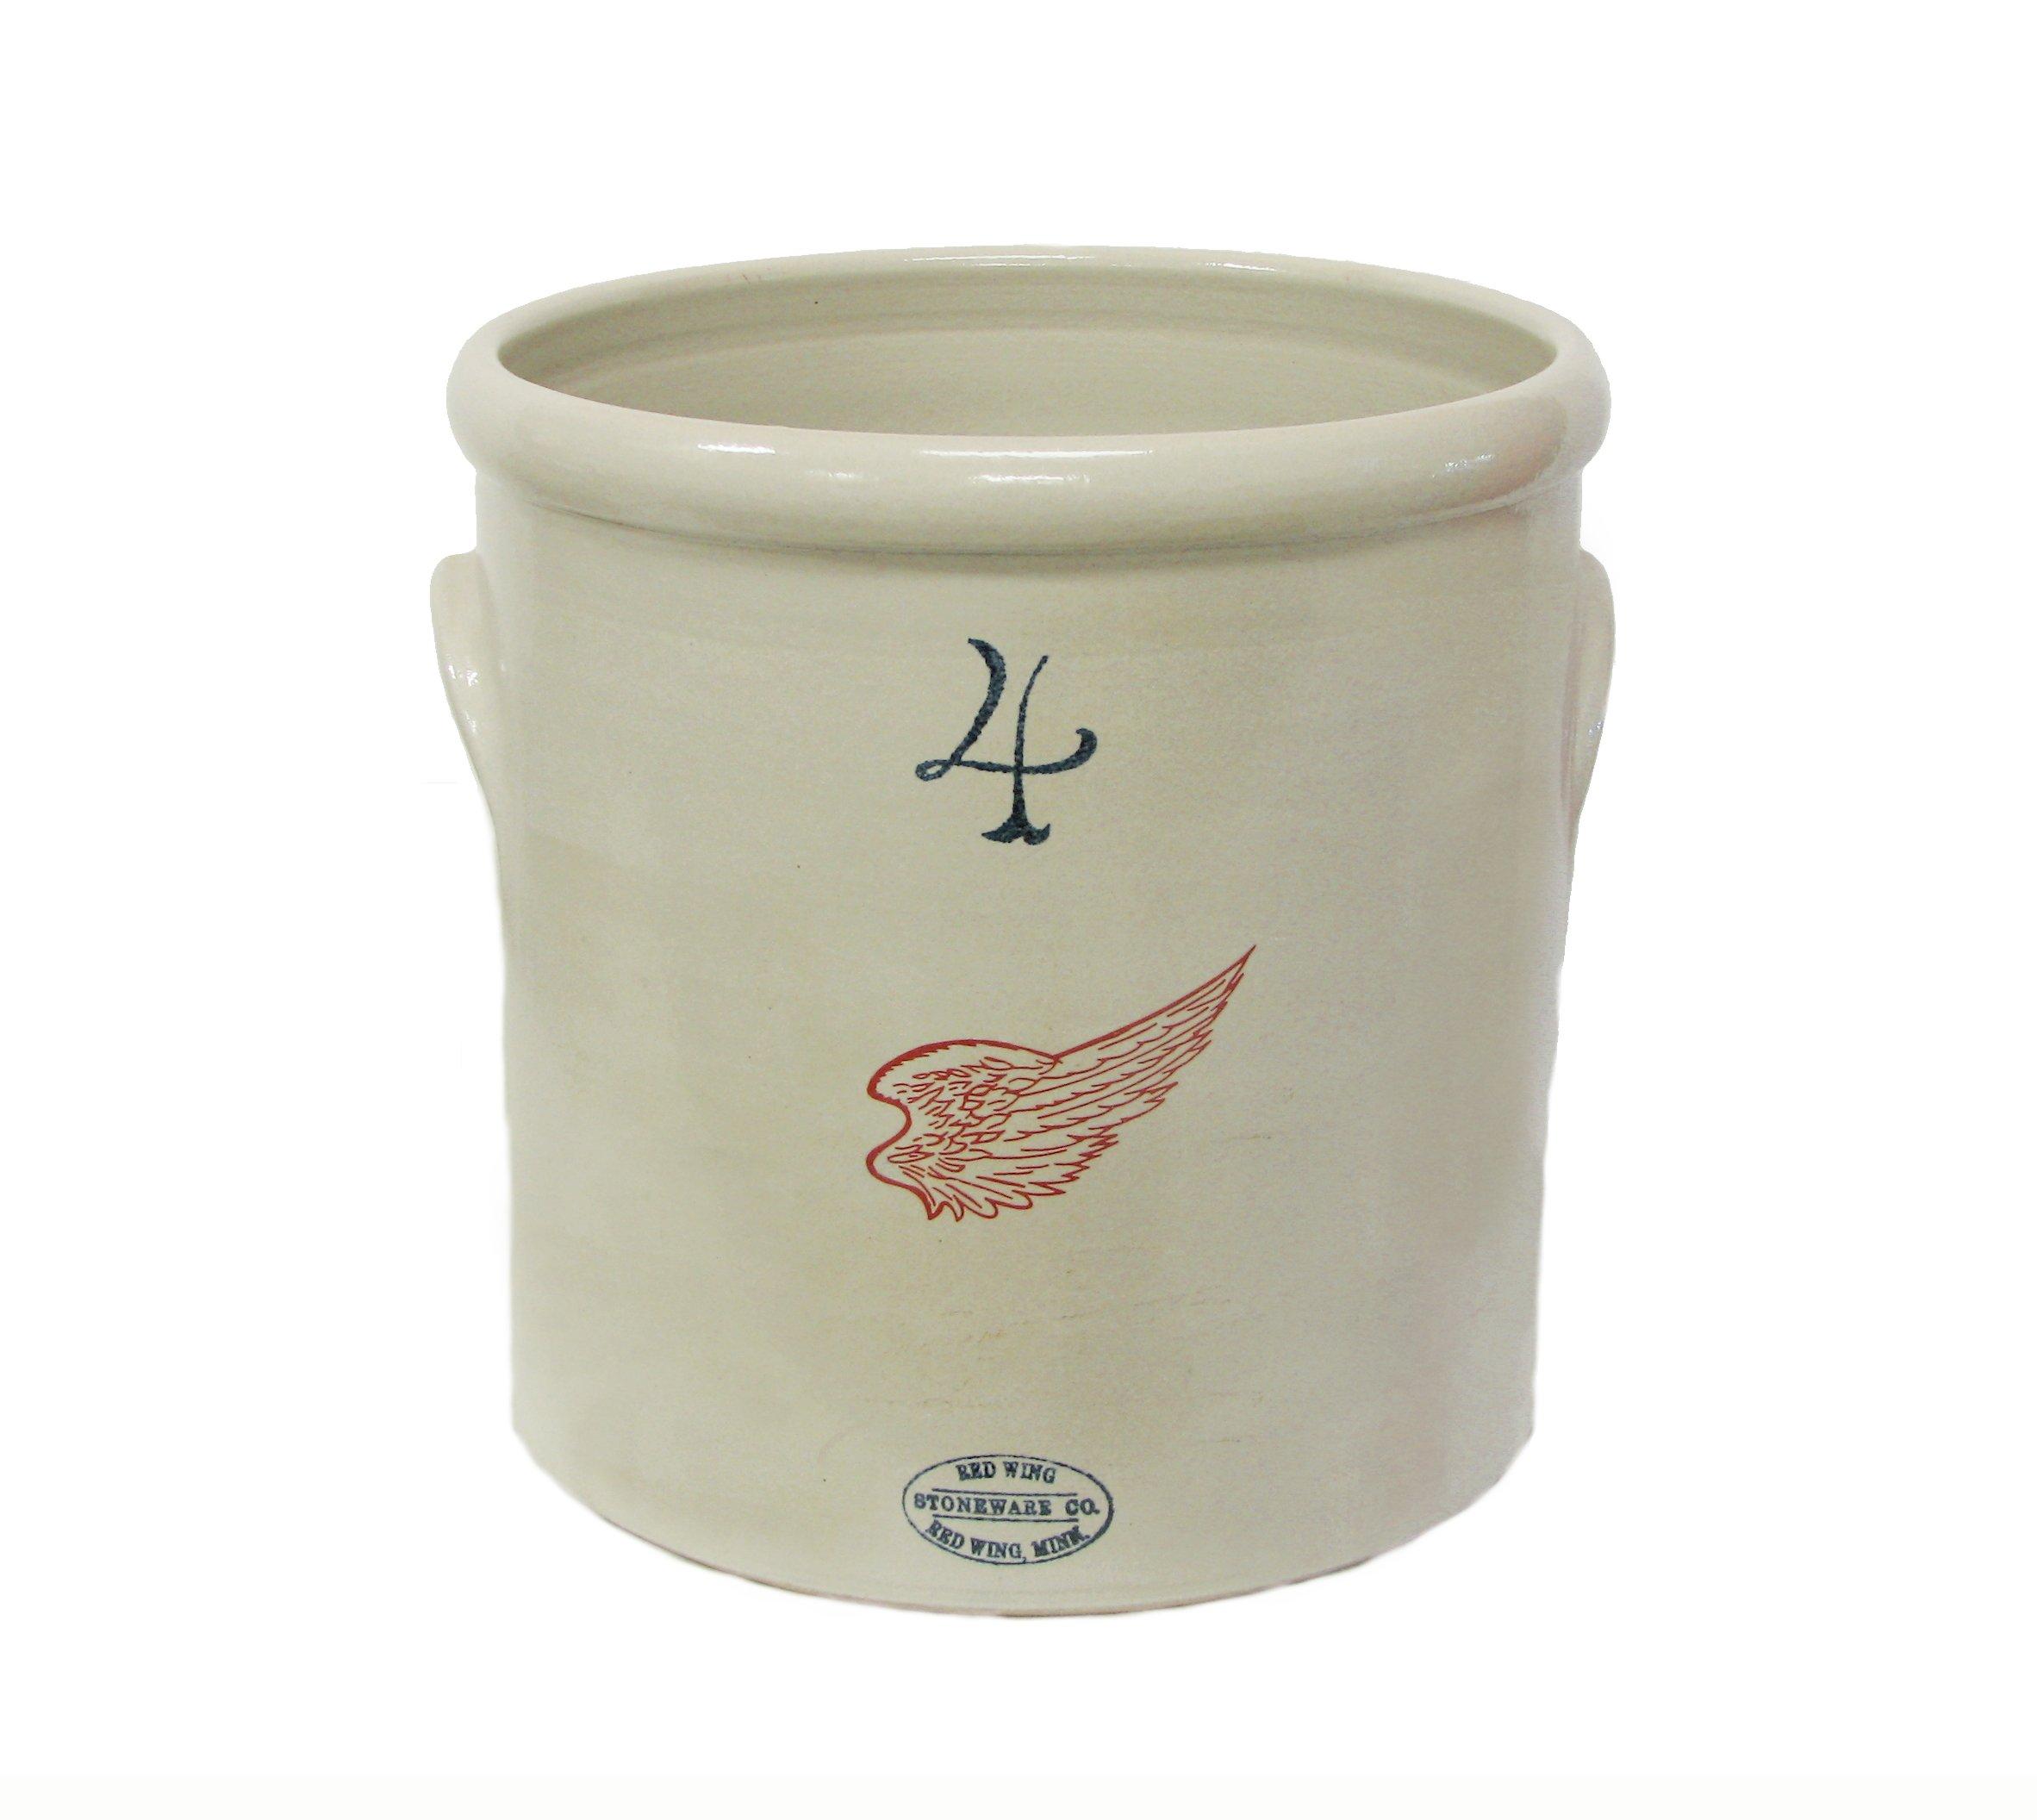 lug handled crocks red wing stoneware amp pottery